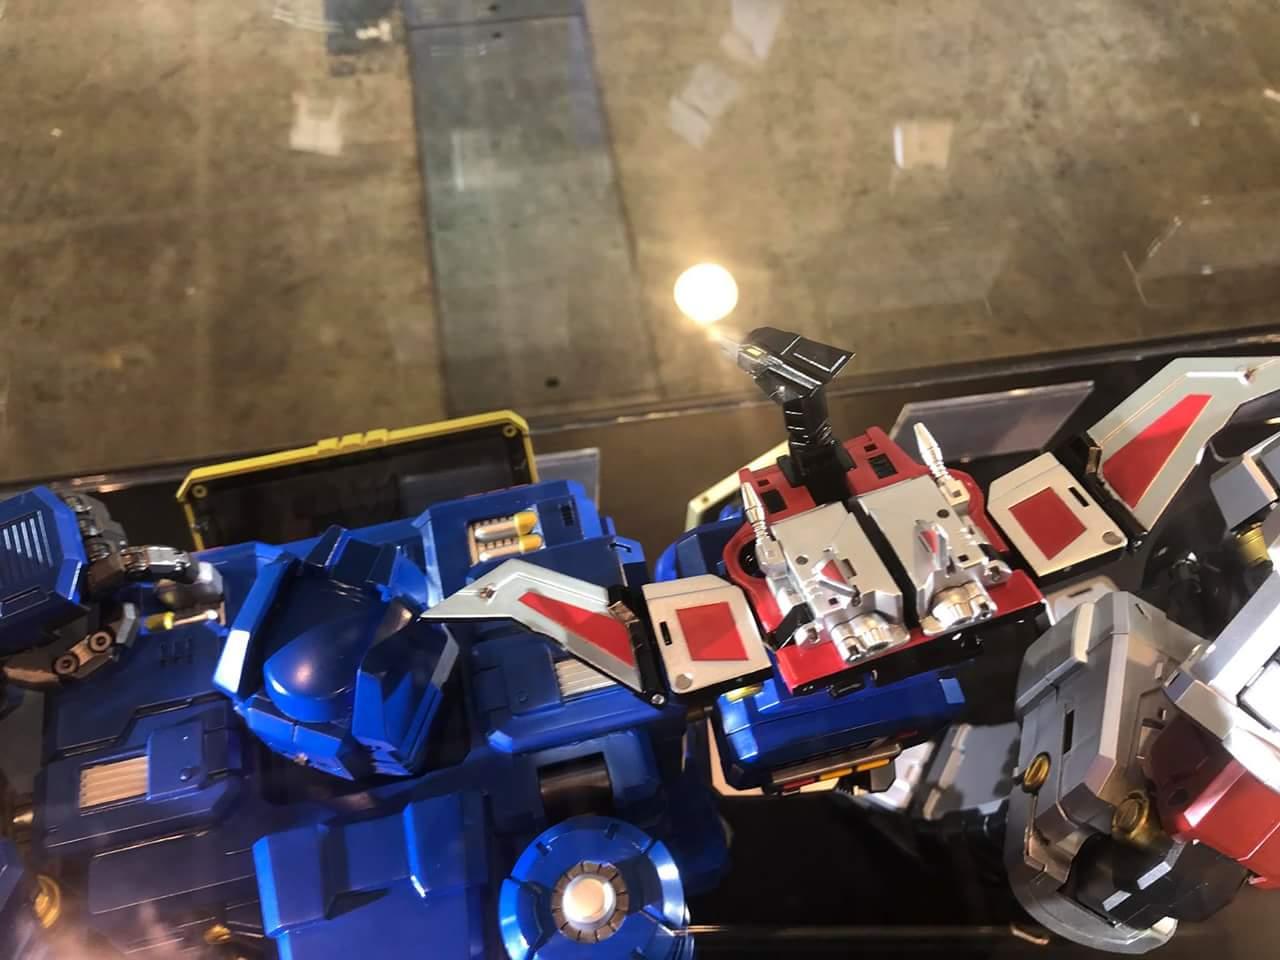 Figurines Transformers G1 (articulé, non transformable) ― Par 3A, Action Toys, Fewture, Toys Alliance, Sentinel, Kotobukiya, Kids Logic, Herocross, EX Gokin, etc - Page 6 OlDancky_o